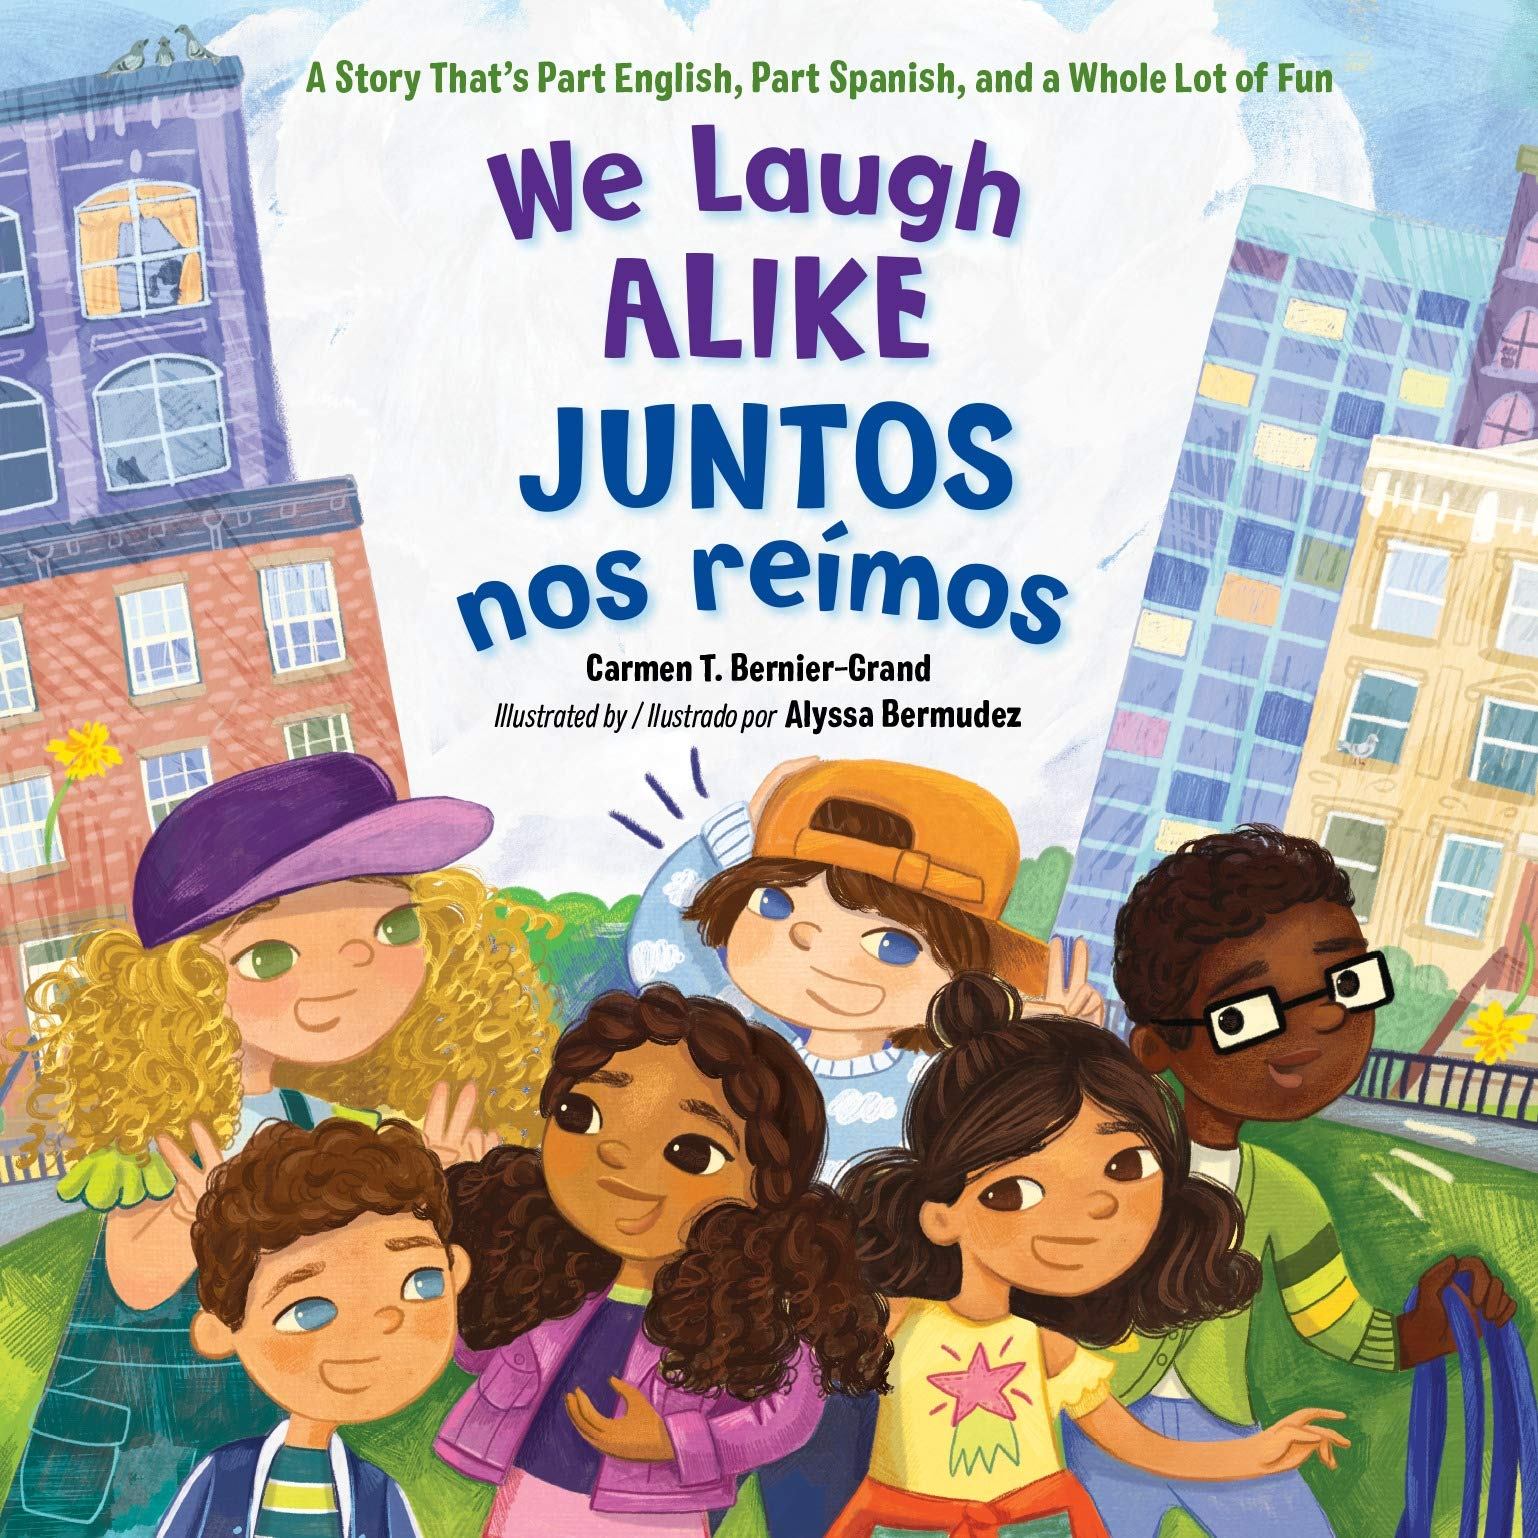 We Laugh Alike / Juntos nos reímos: A Story That's Part Spanish, Part  English, and a Whole Lot of Fun: Bernier-Grand, Carmen T., Bermudez,  Alyssa: 9781623540968: Amazon.com: Books